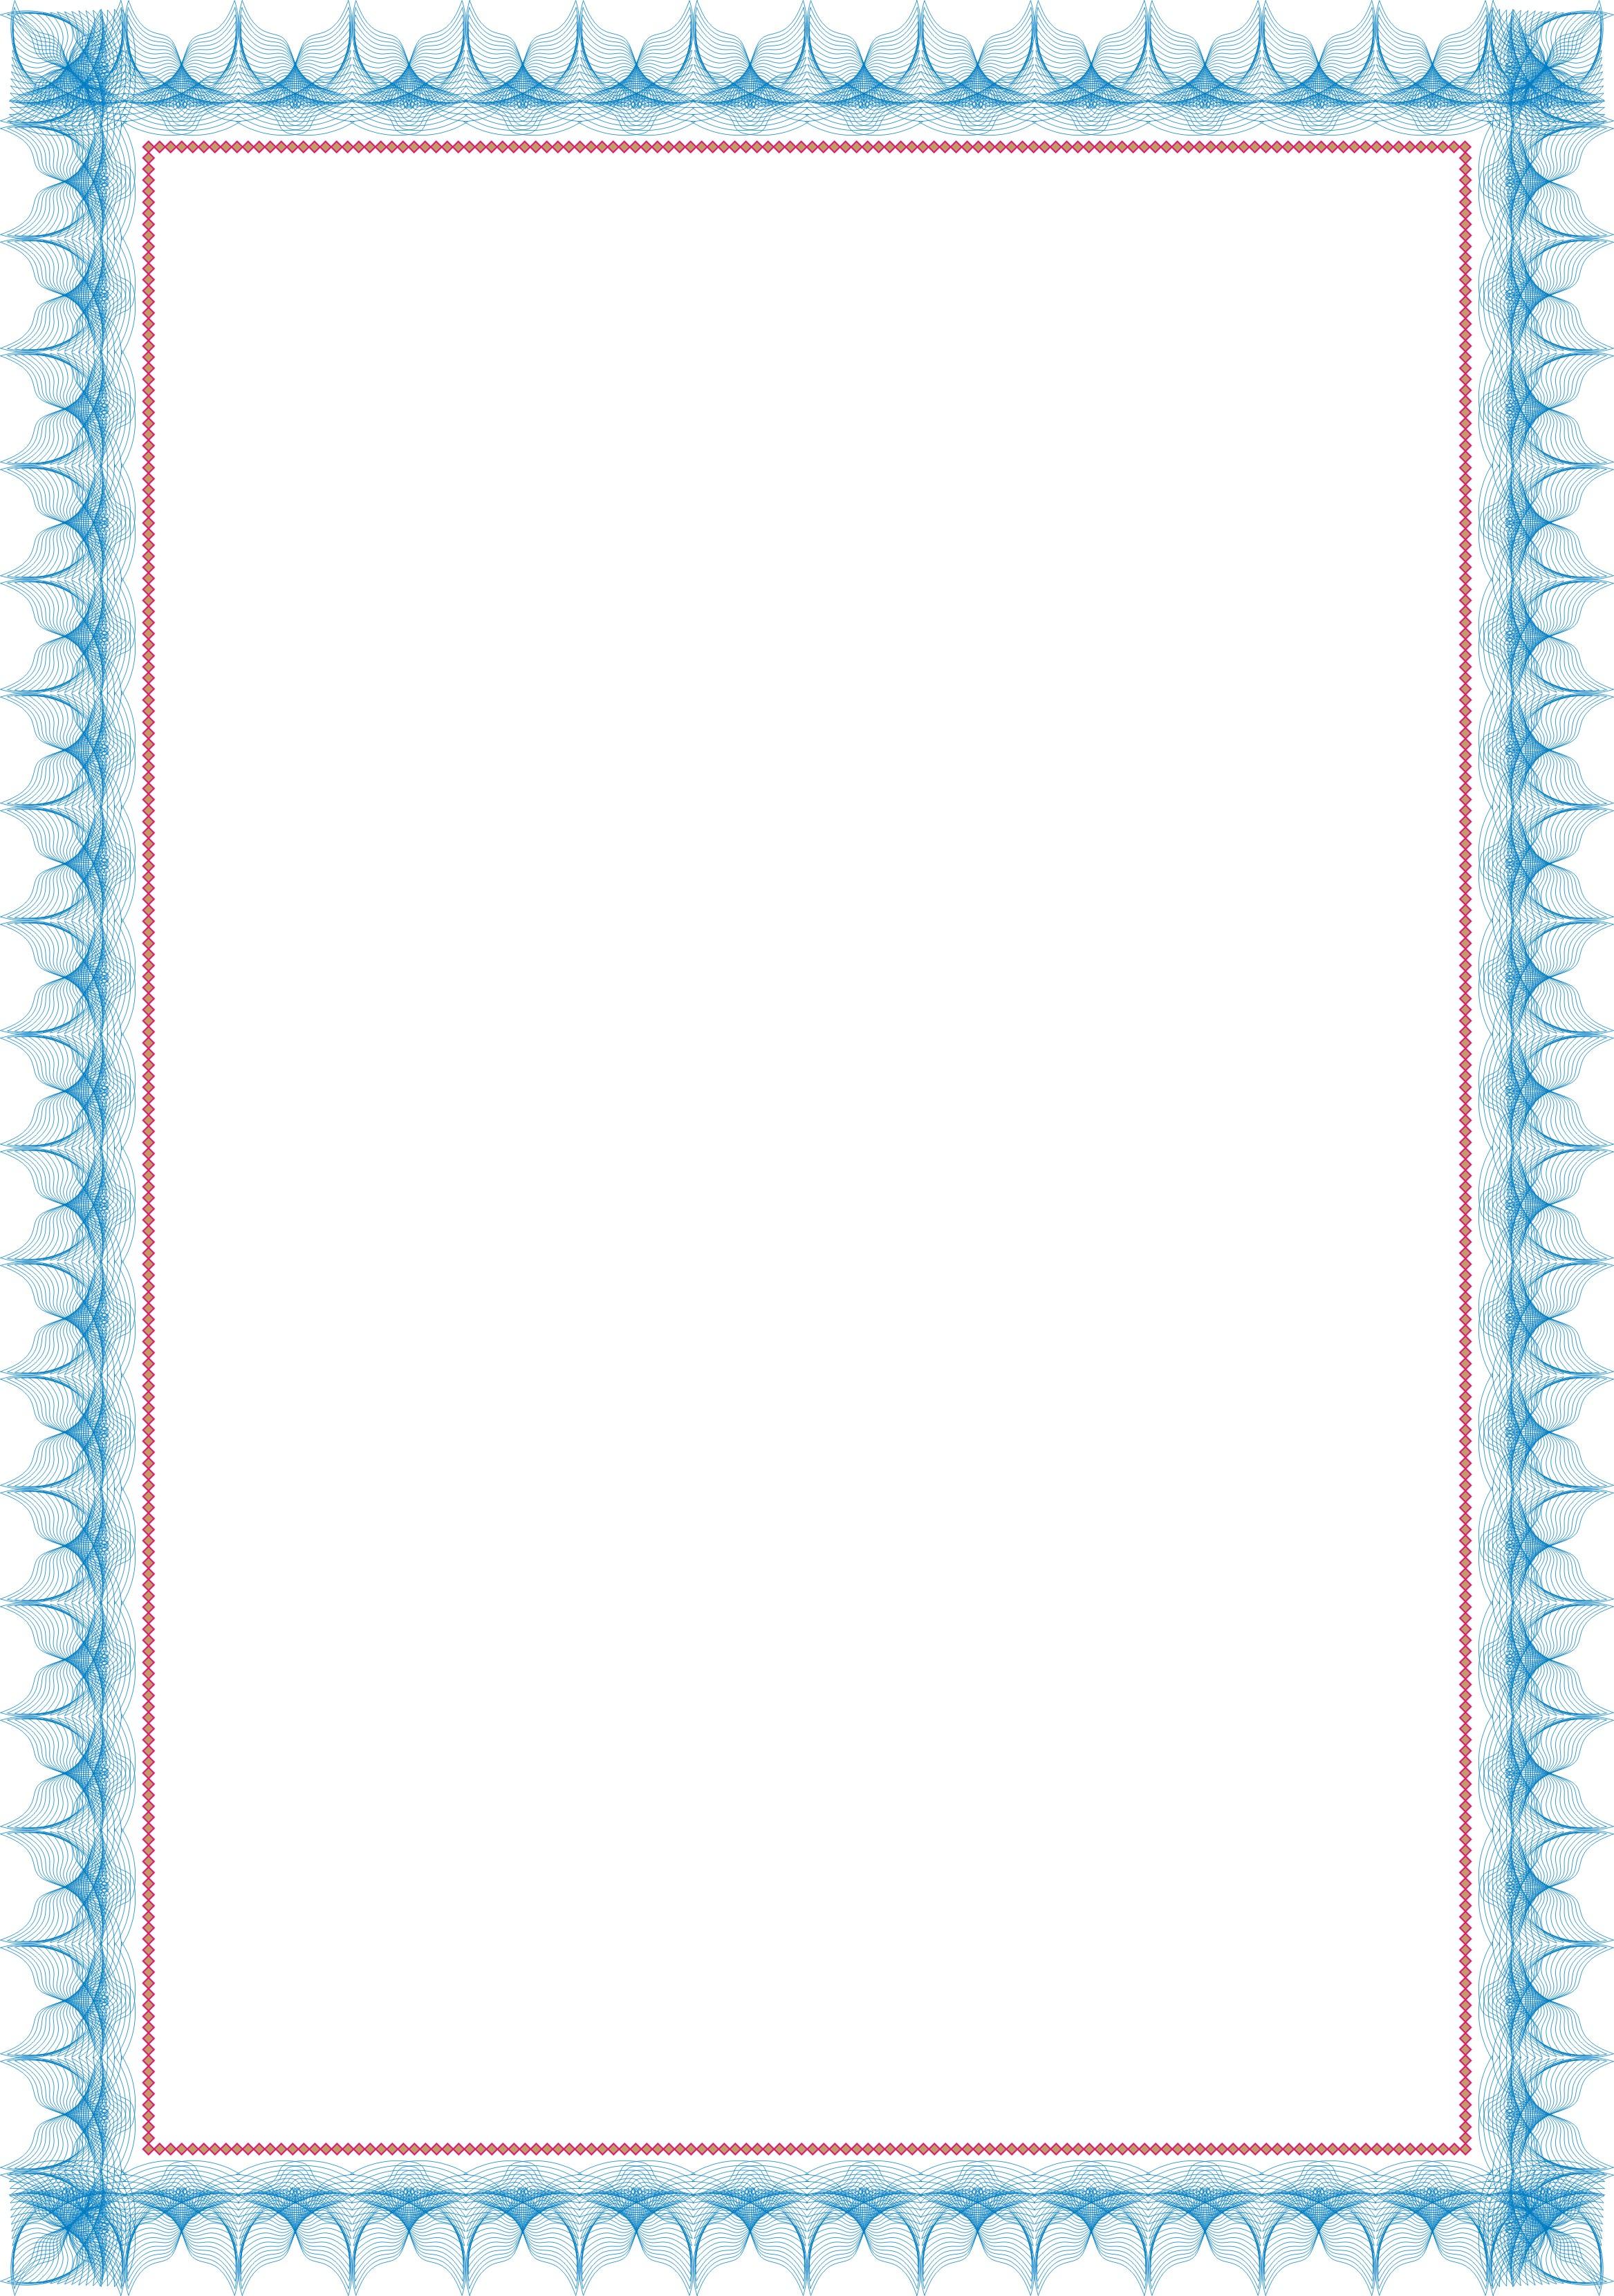 bingkai_biru.jpg